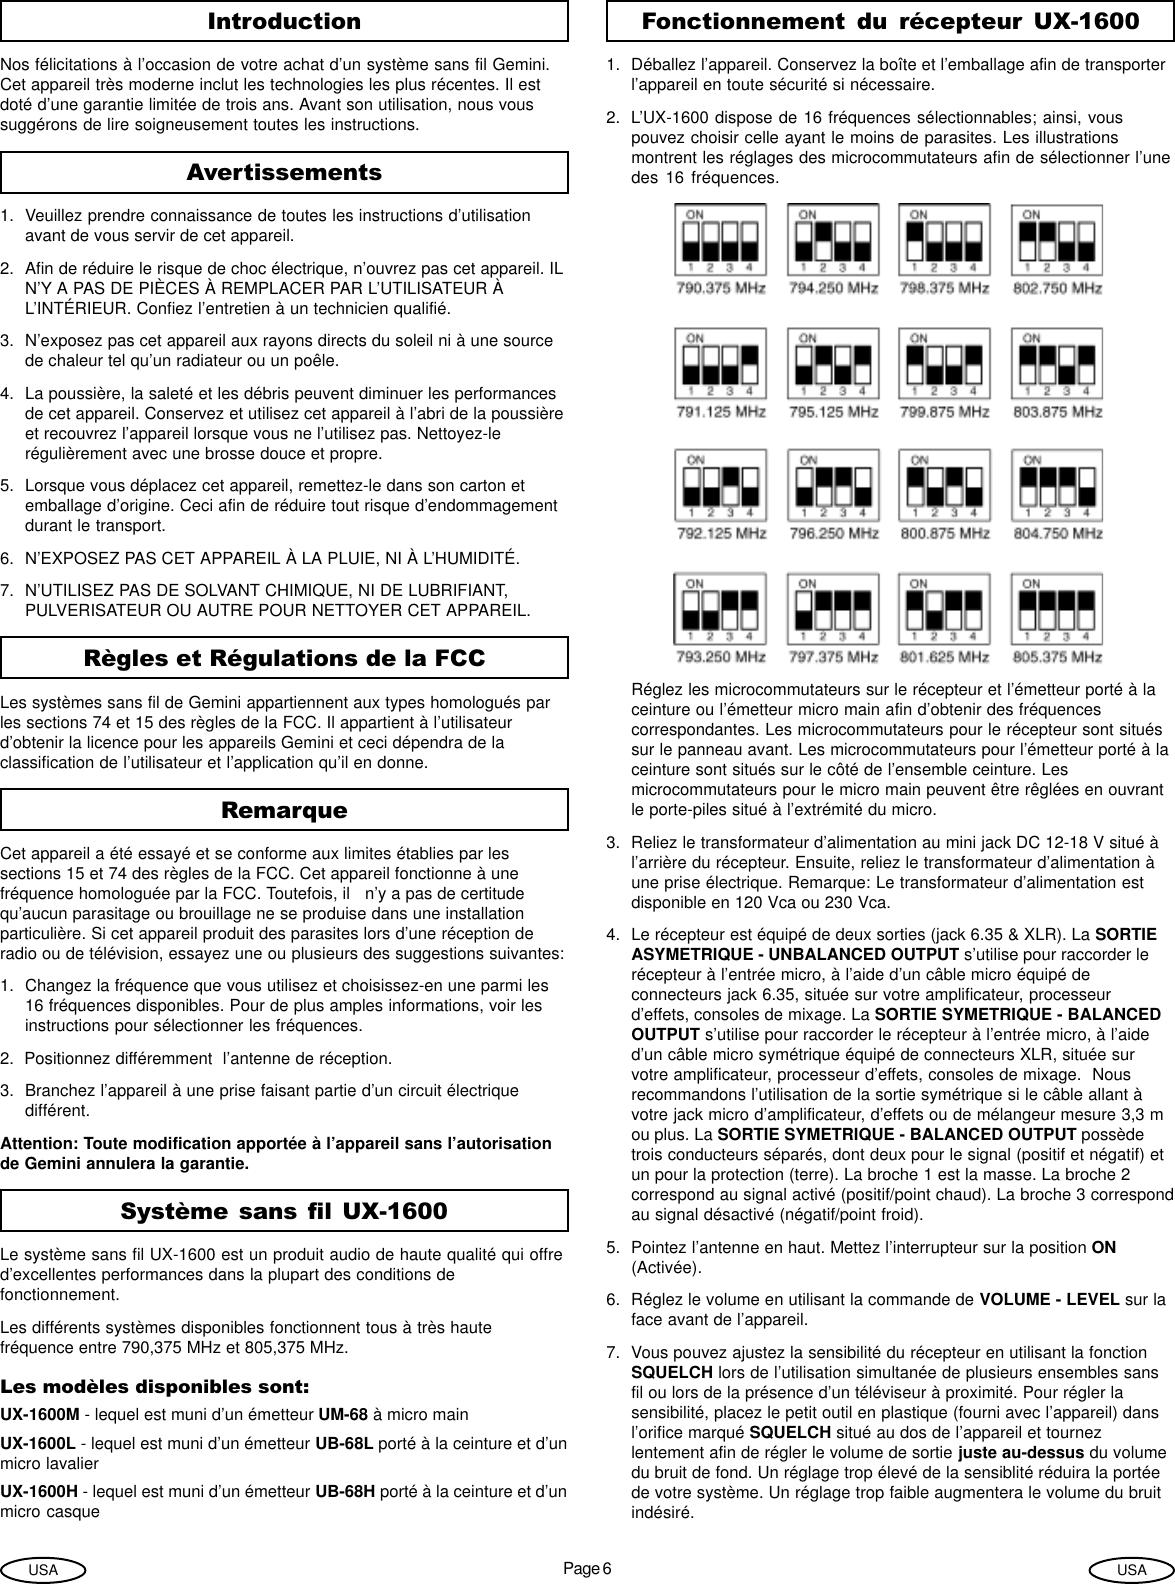 Radiateur Electrique Wikipedia concernant gemini industries uhf ux 1600 users manual